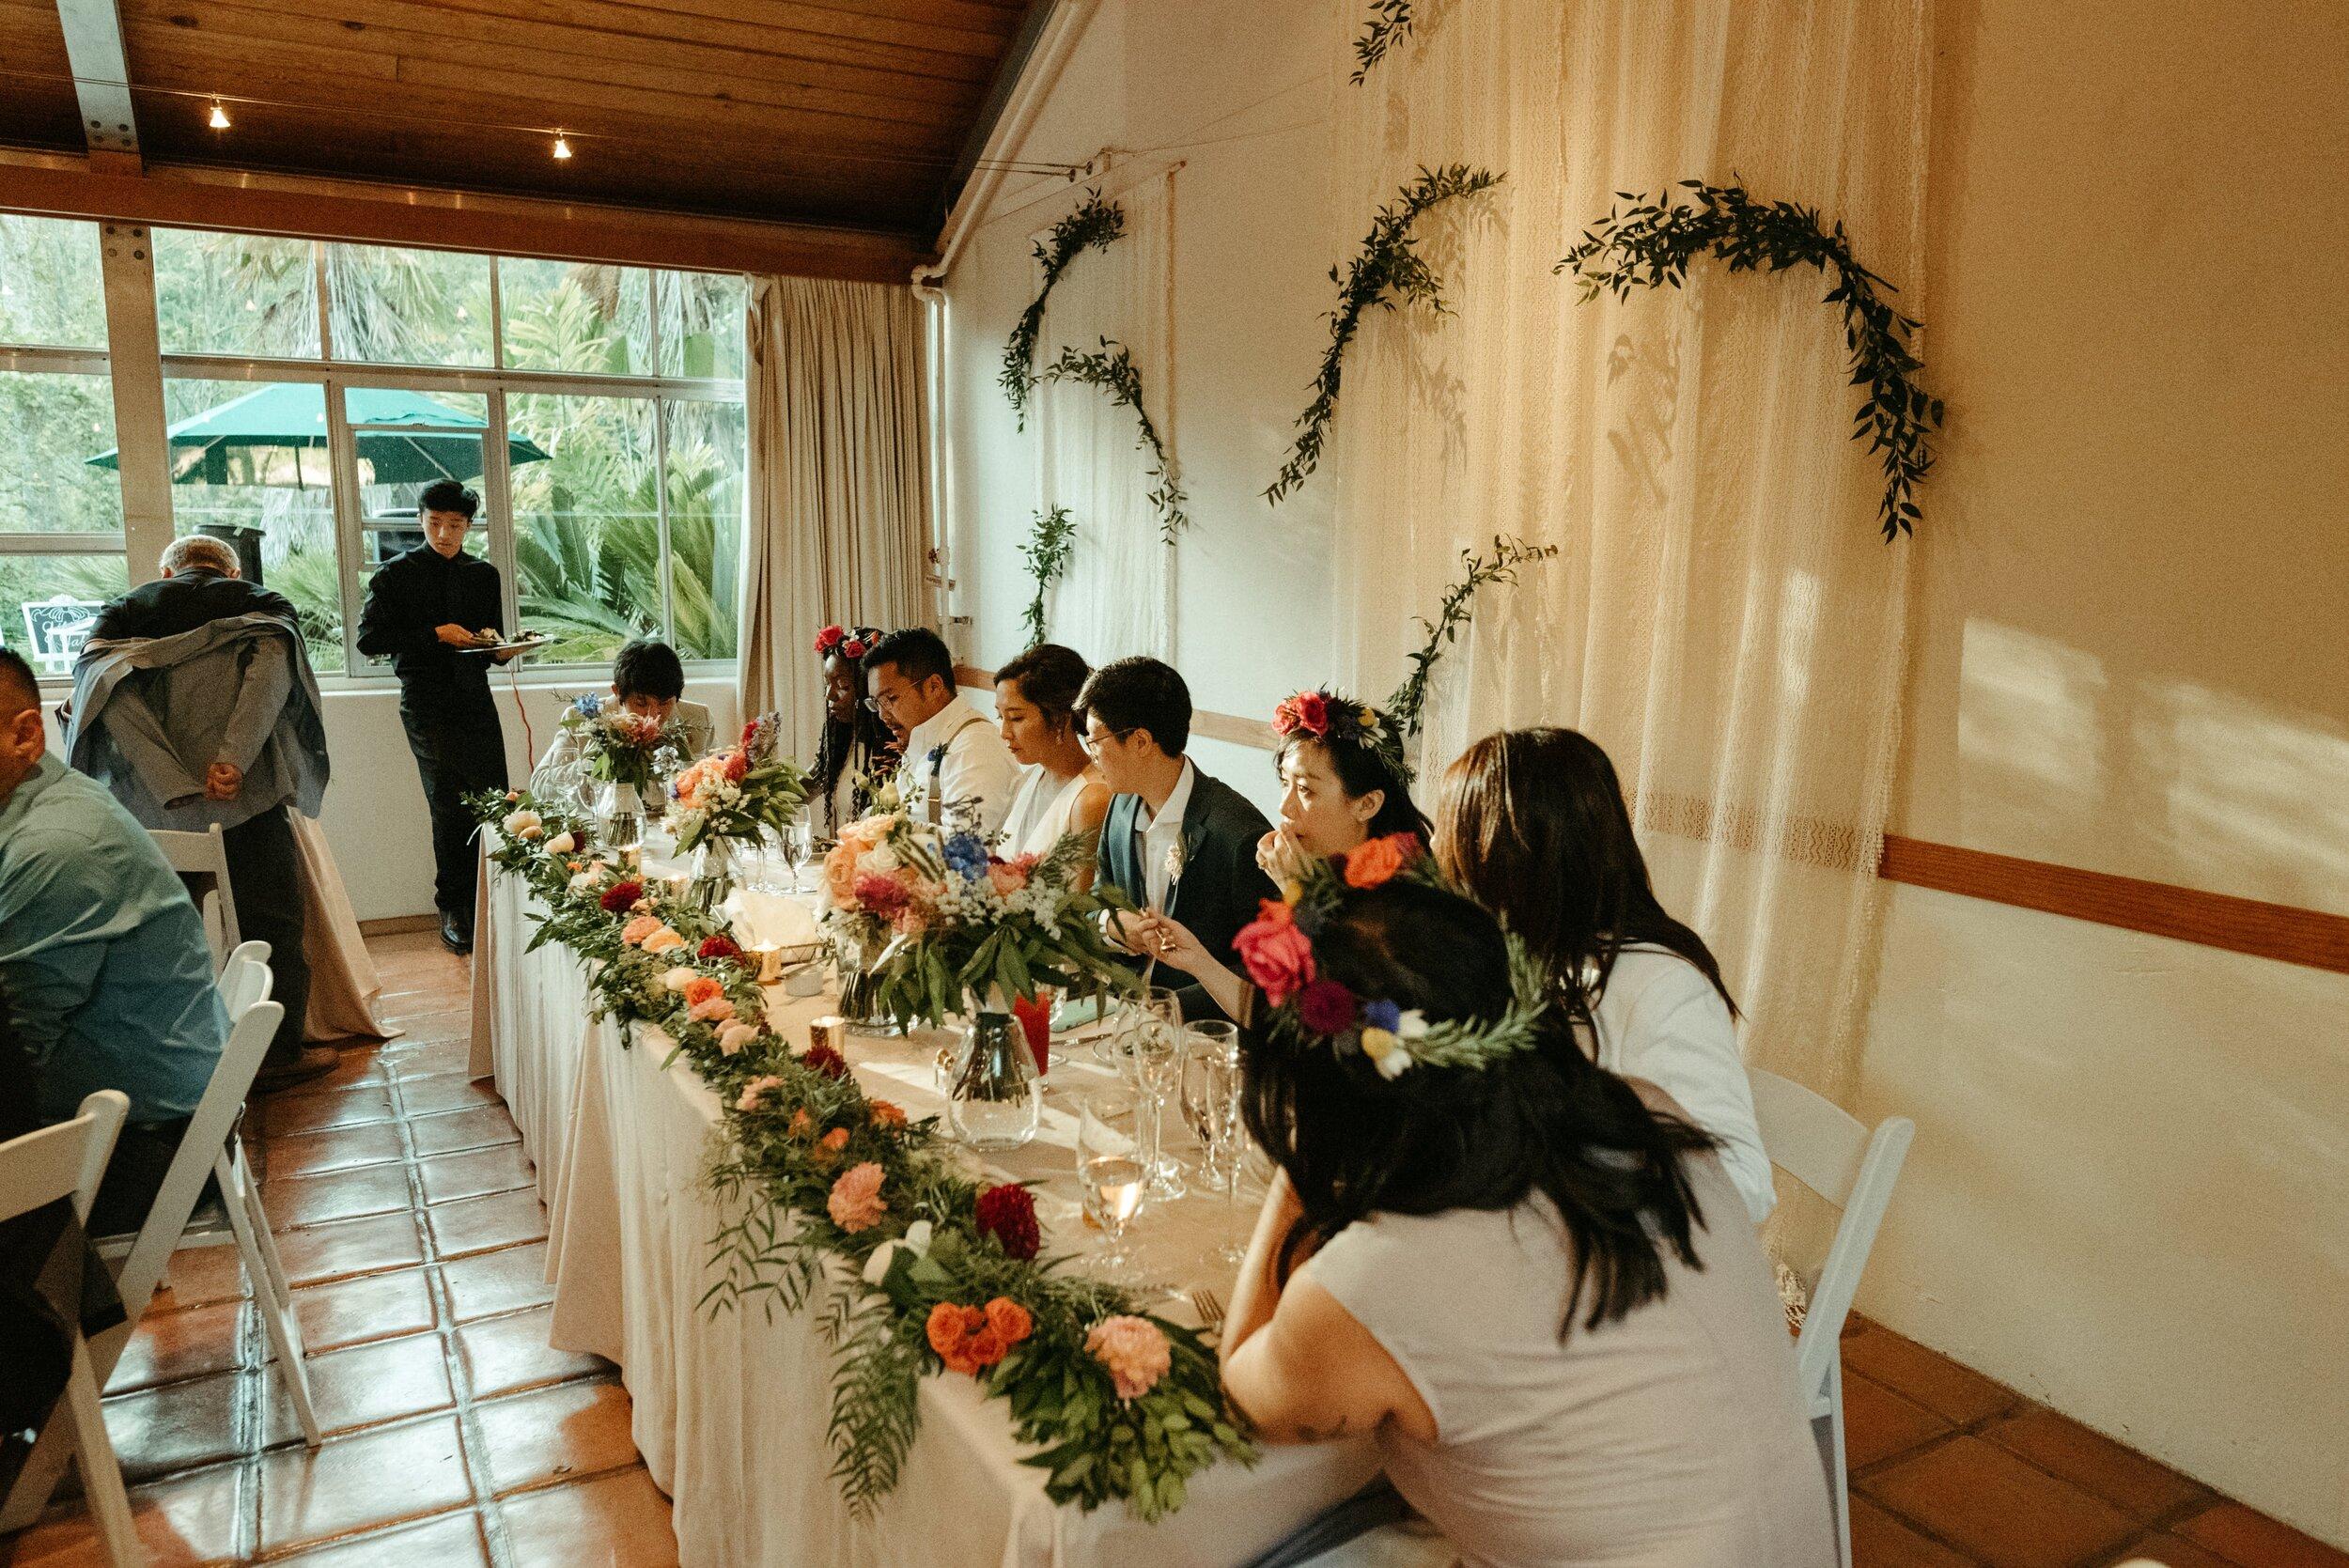 car-mika-uc-botanical-garden-reception-93.jpg